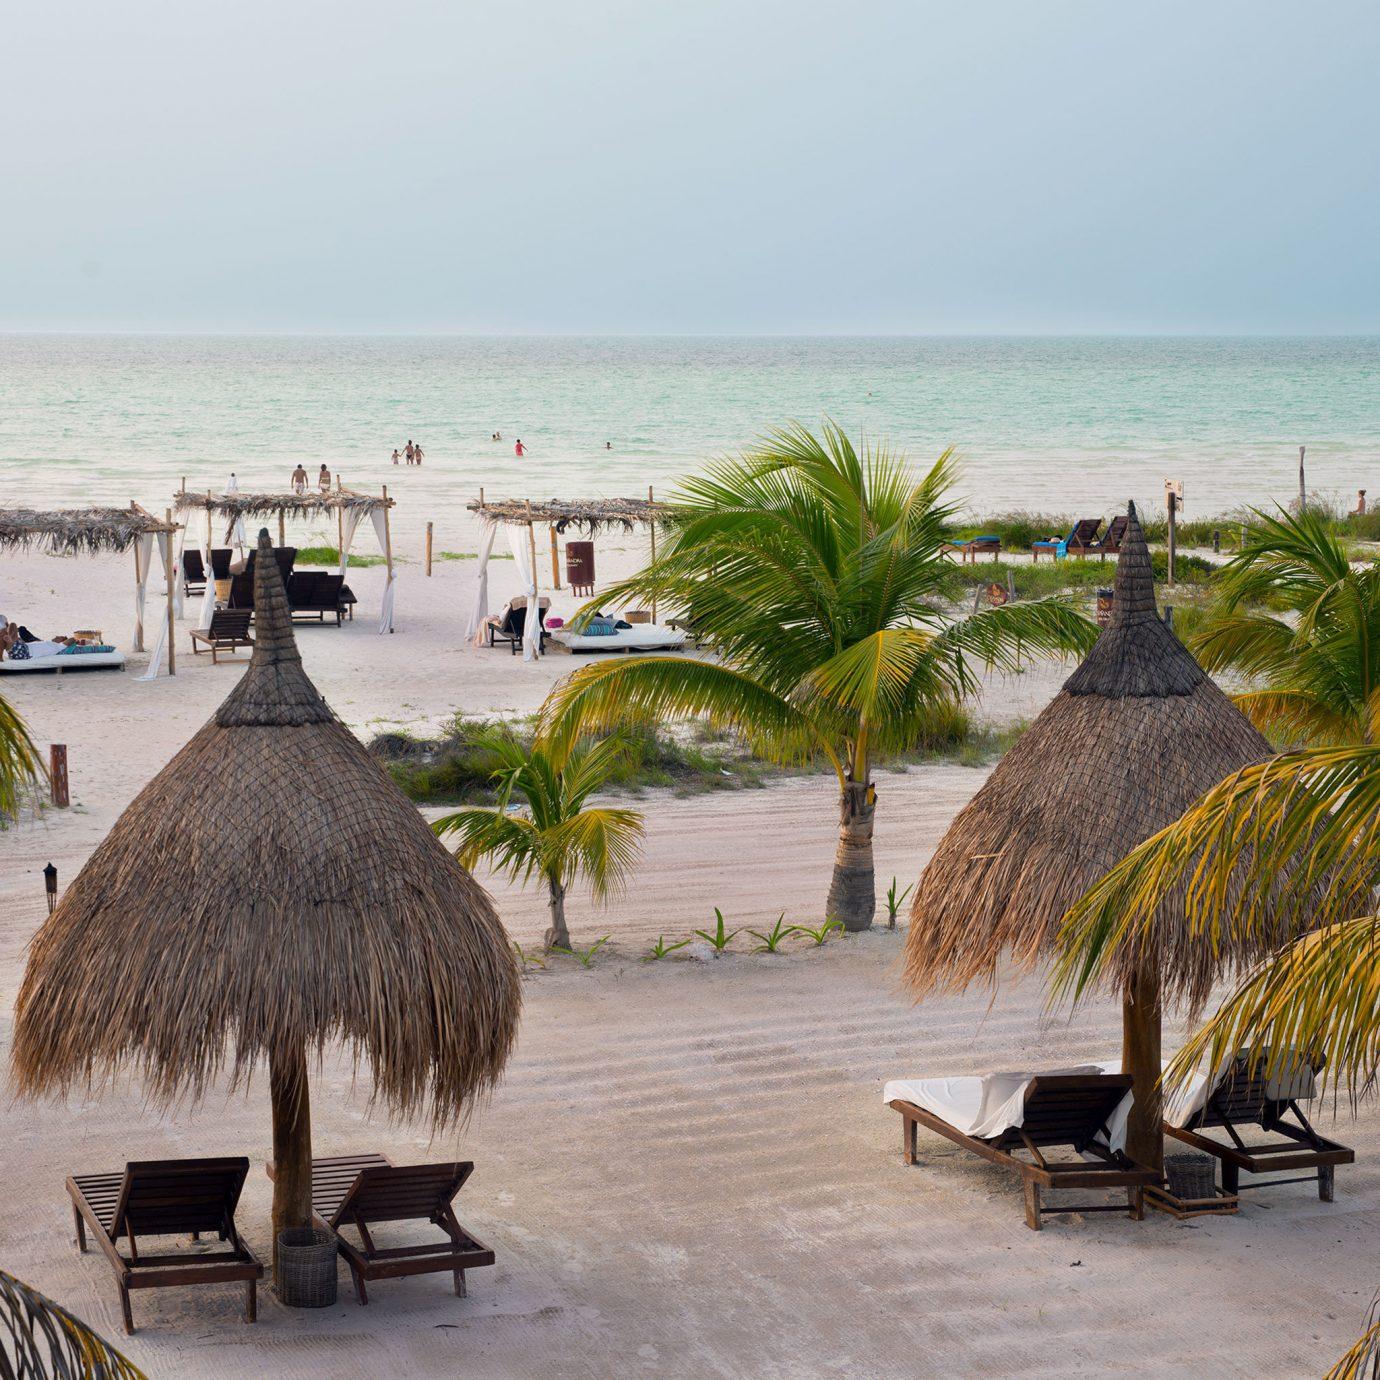 Beach Beachfront water sky tree plant palm Ocean Resort Sea shore arecales palm family tropics caribbean Coast travel Pool sandy lined swimming shade